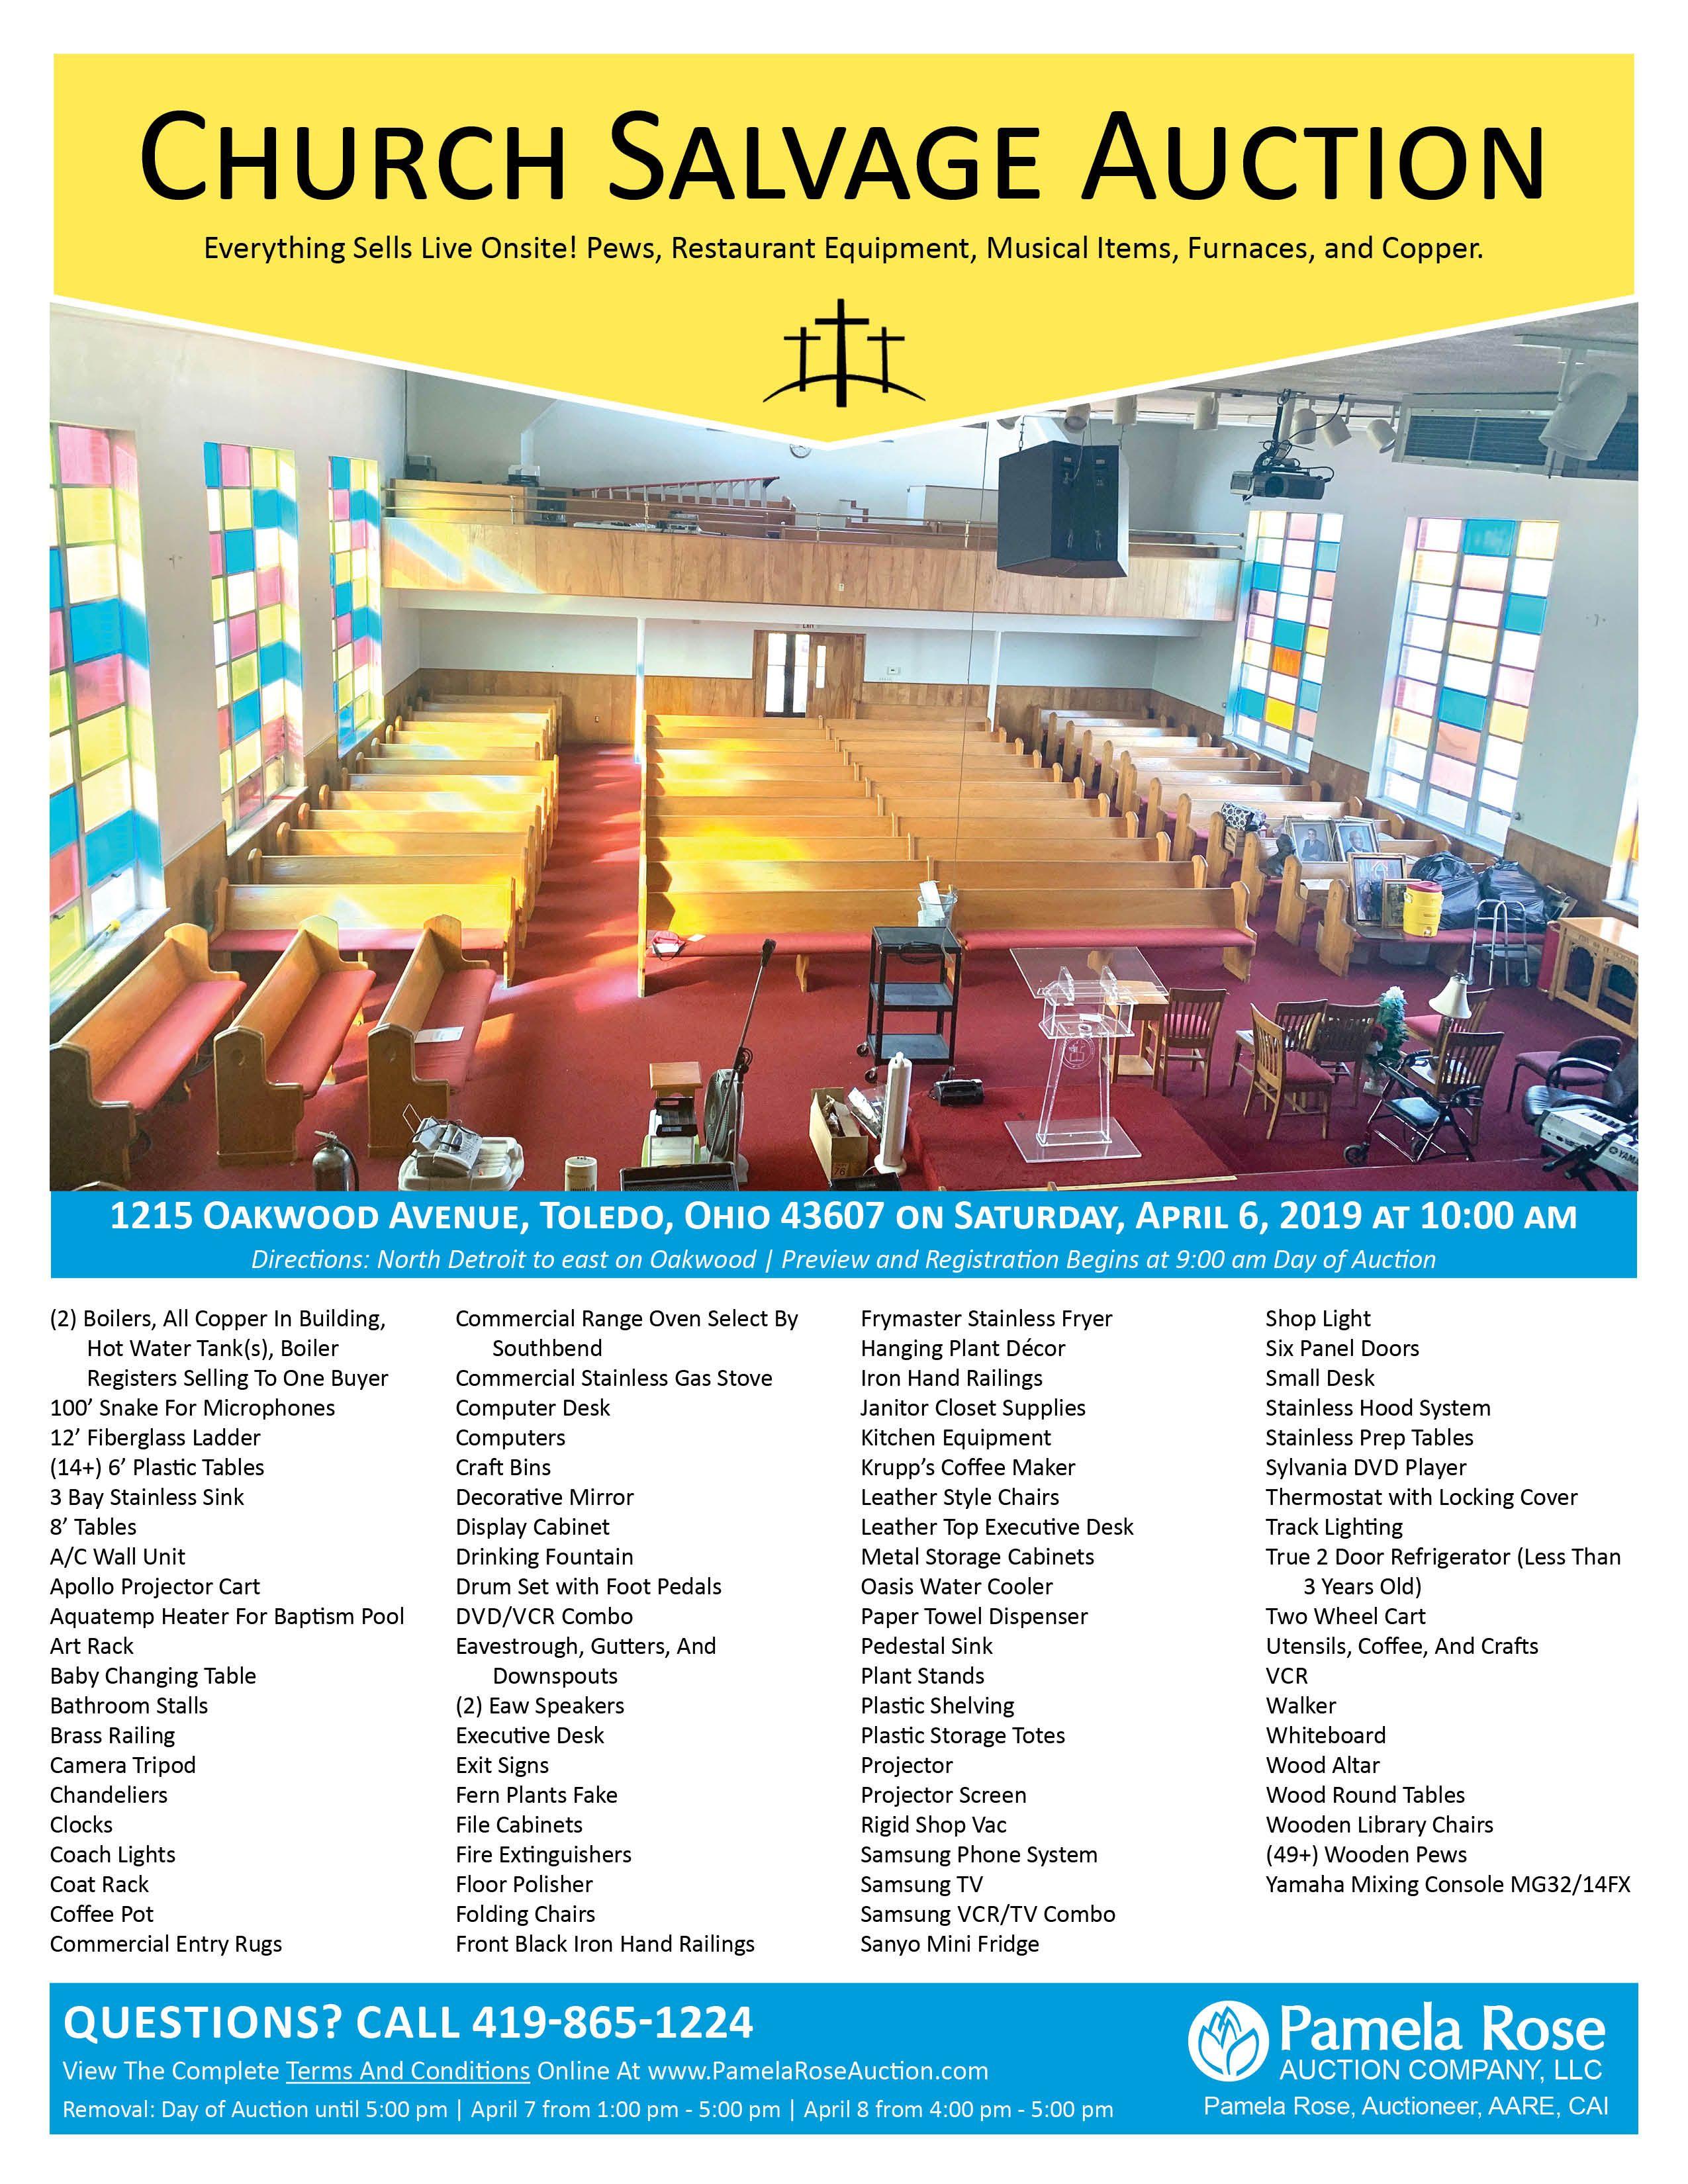 Church Salvage Auction Live Onsite Restaurant Equipment Auction Salvage